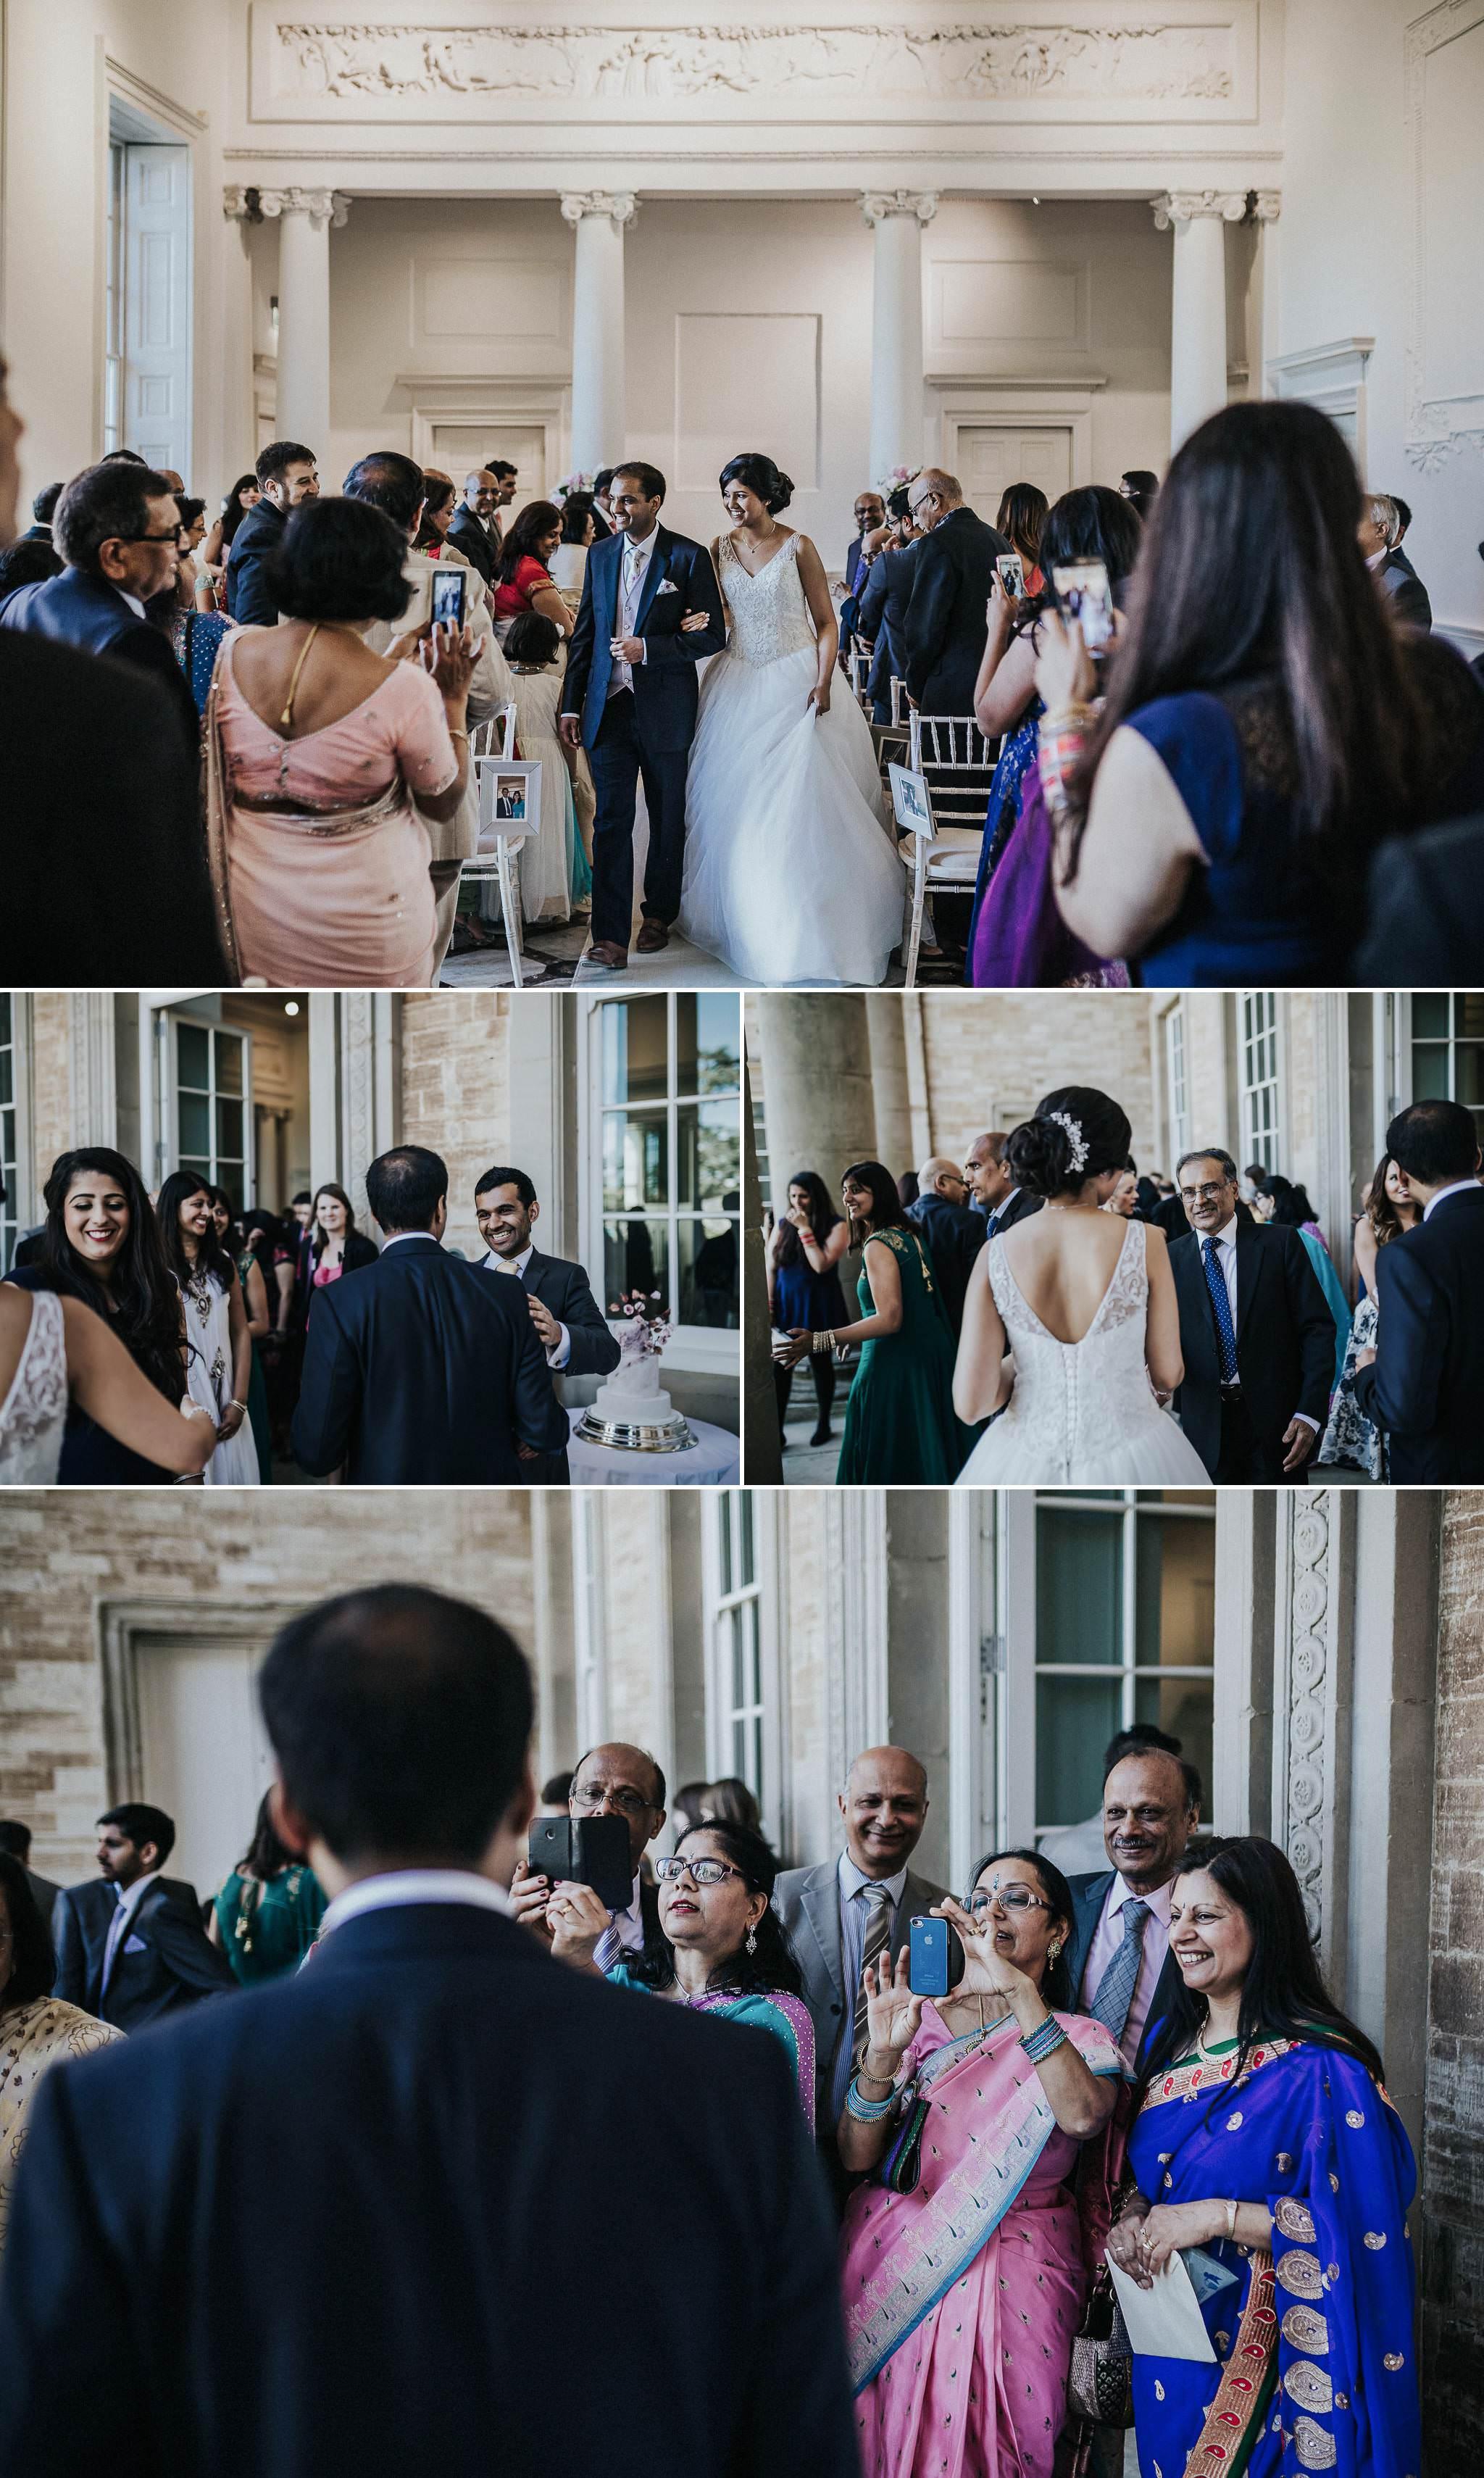 compton-verney-wedding-photos 17.jpg